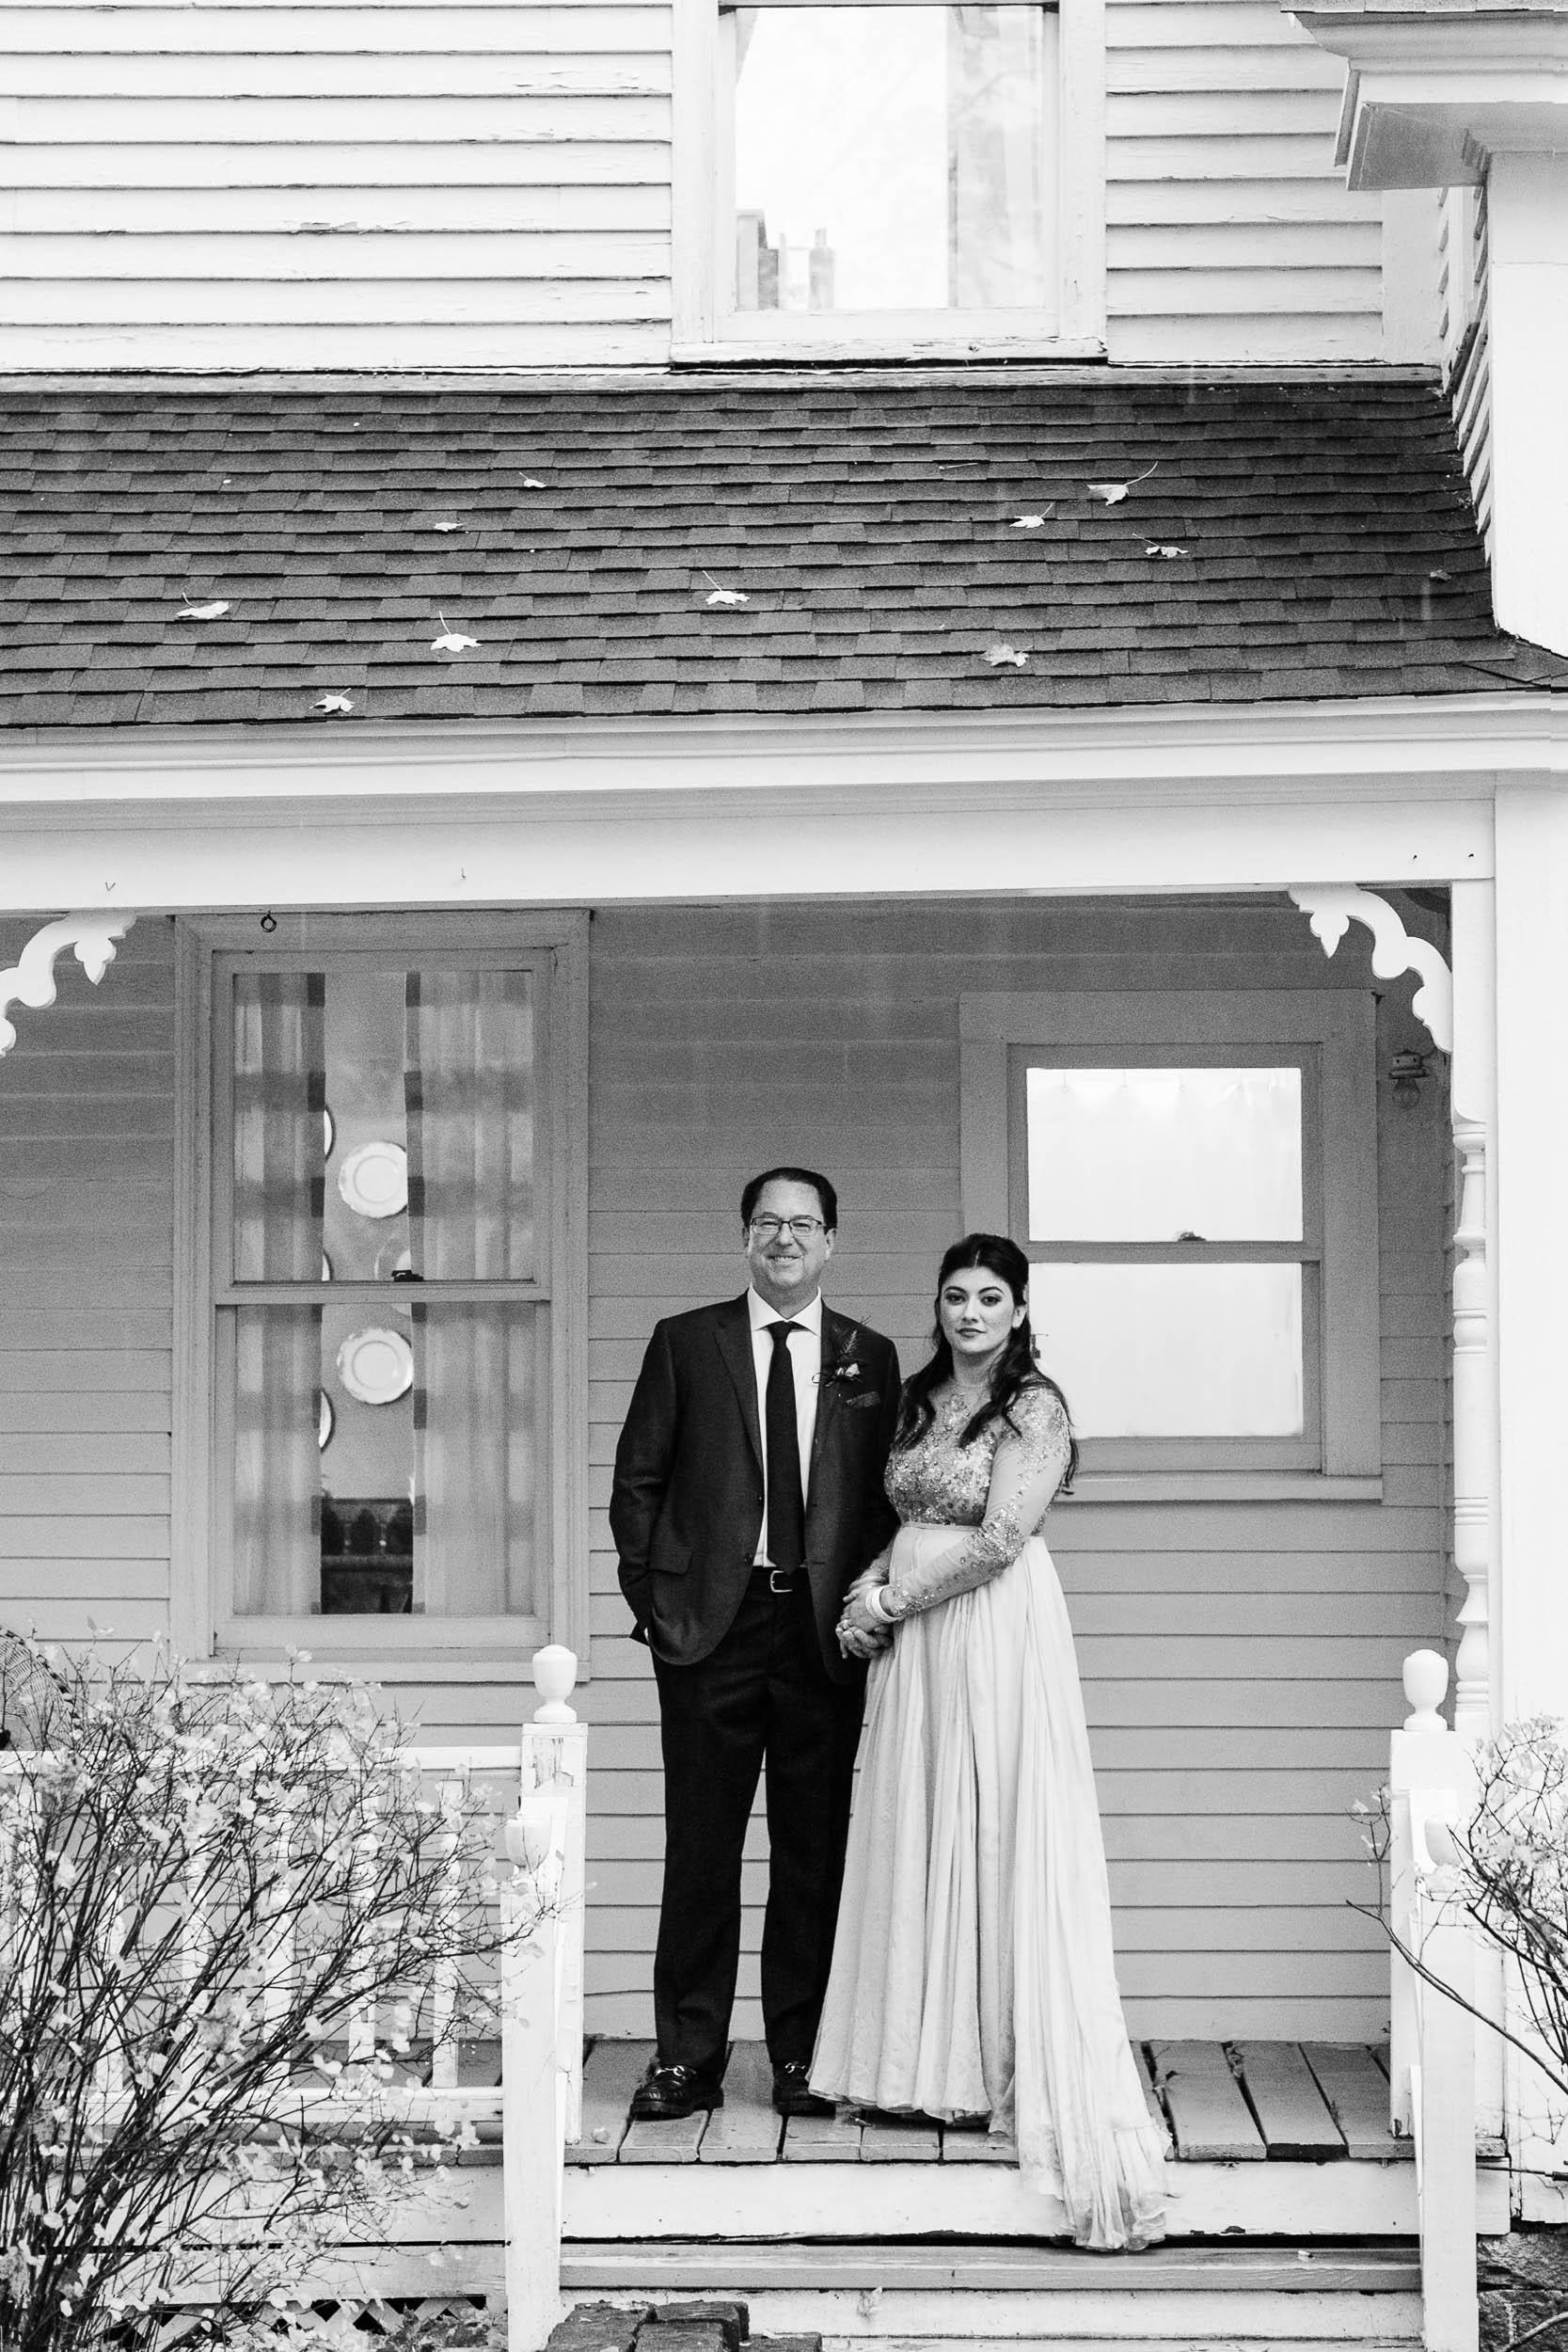 J+J_Barn at Walnut Hill_Portland Maine Wedding_Buena Lane Photography_102718_ER_445-2.jpg